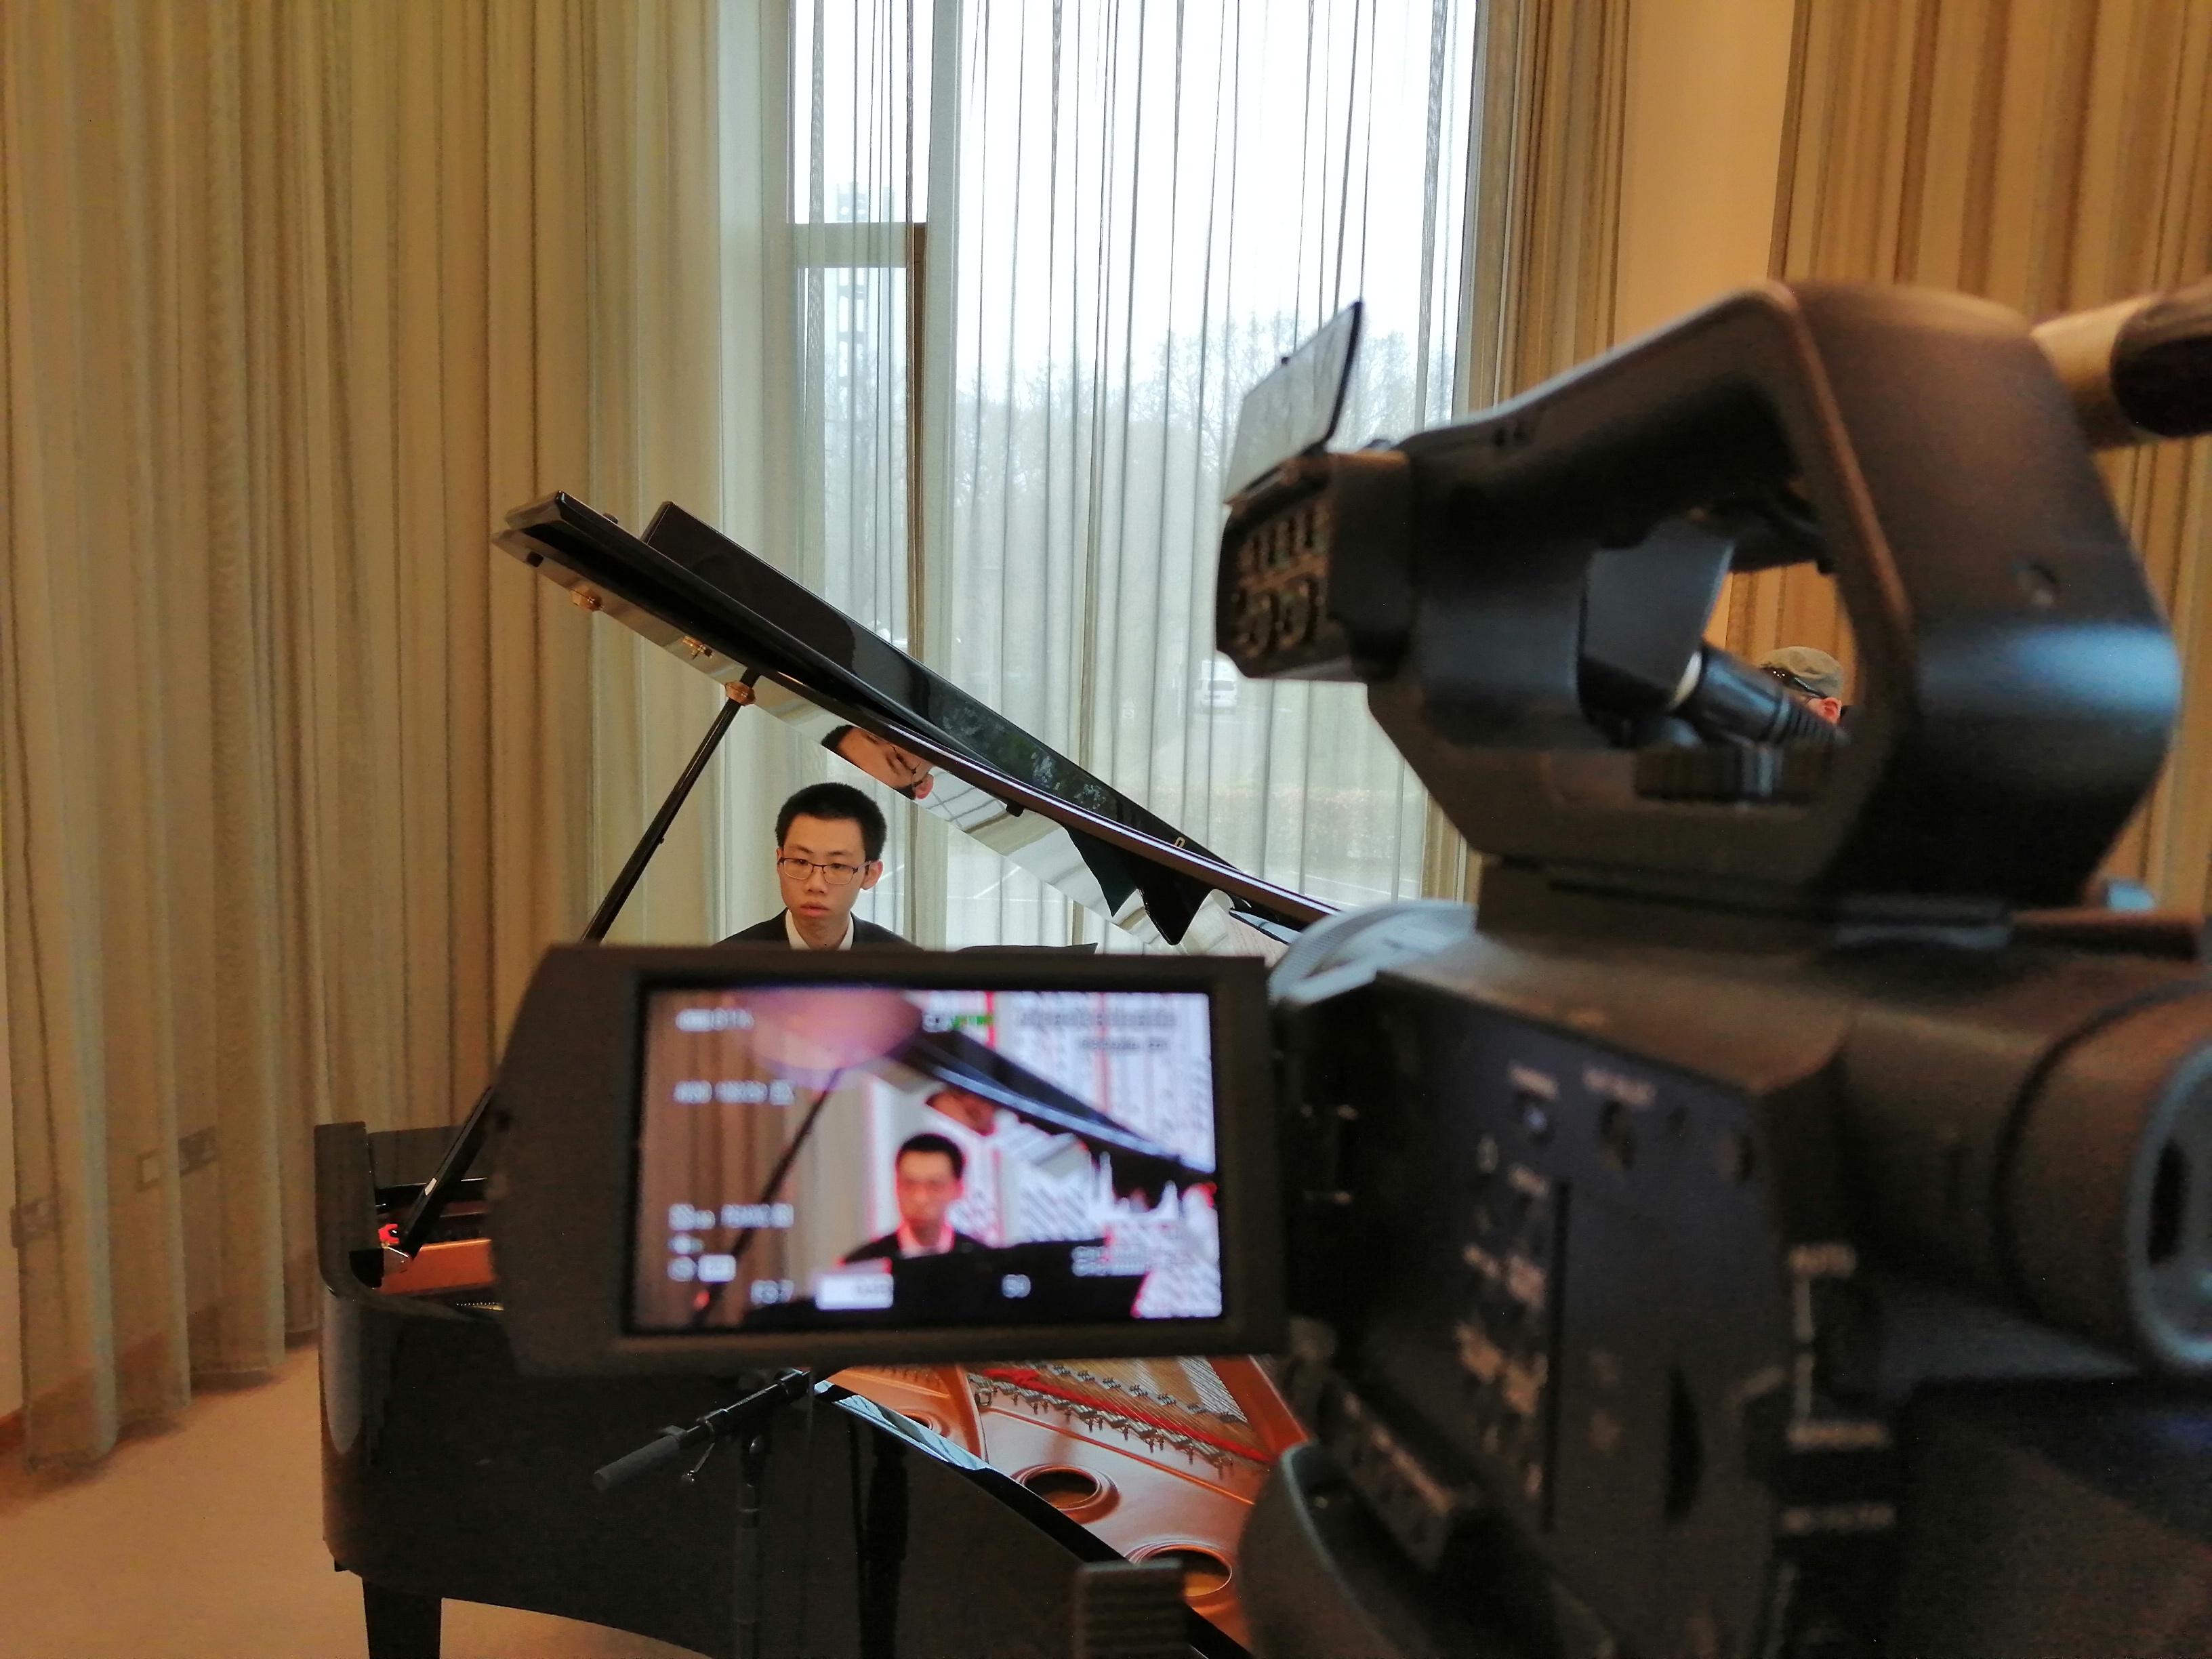 Scholars' Spotlight: filming continues